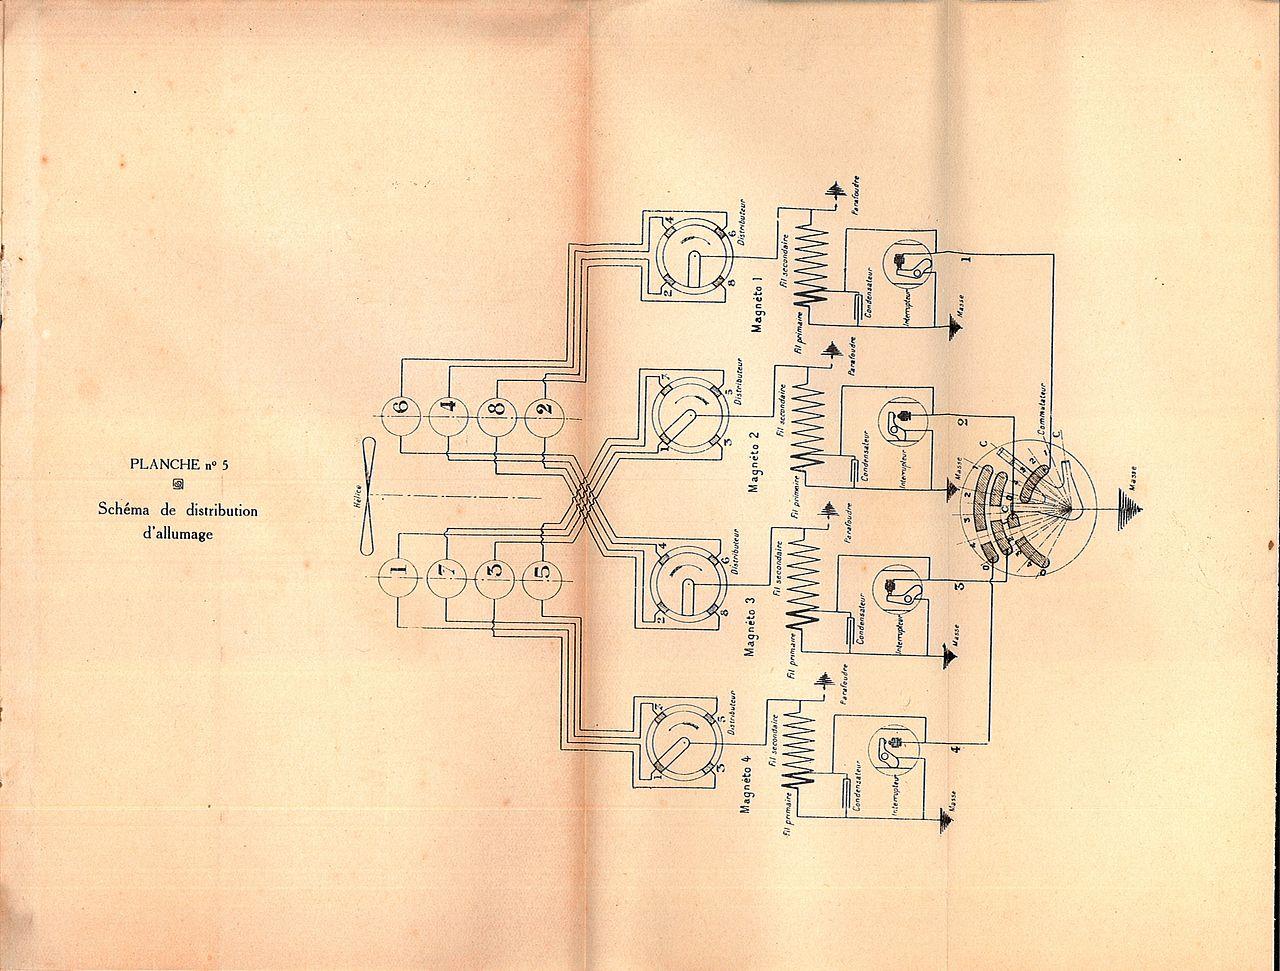 hight resolution of file renault 190hp wiring diagram drawing5 jpg